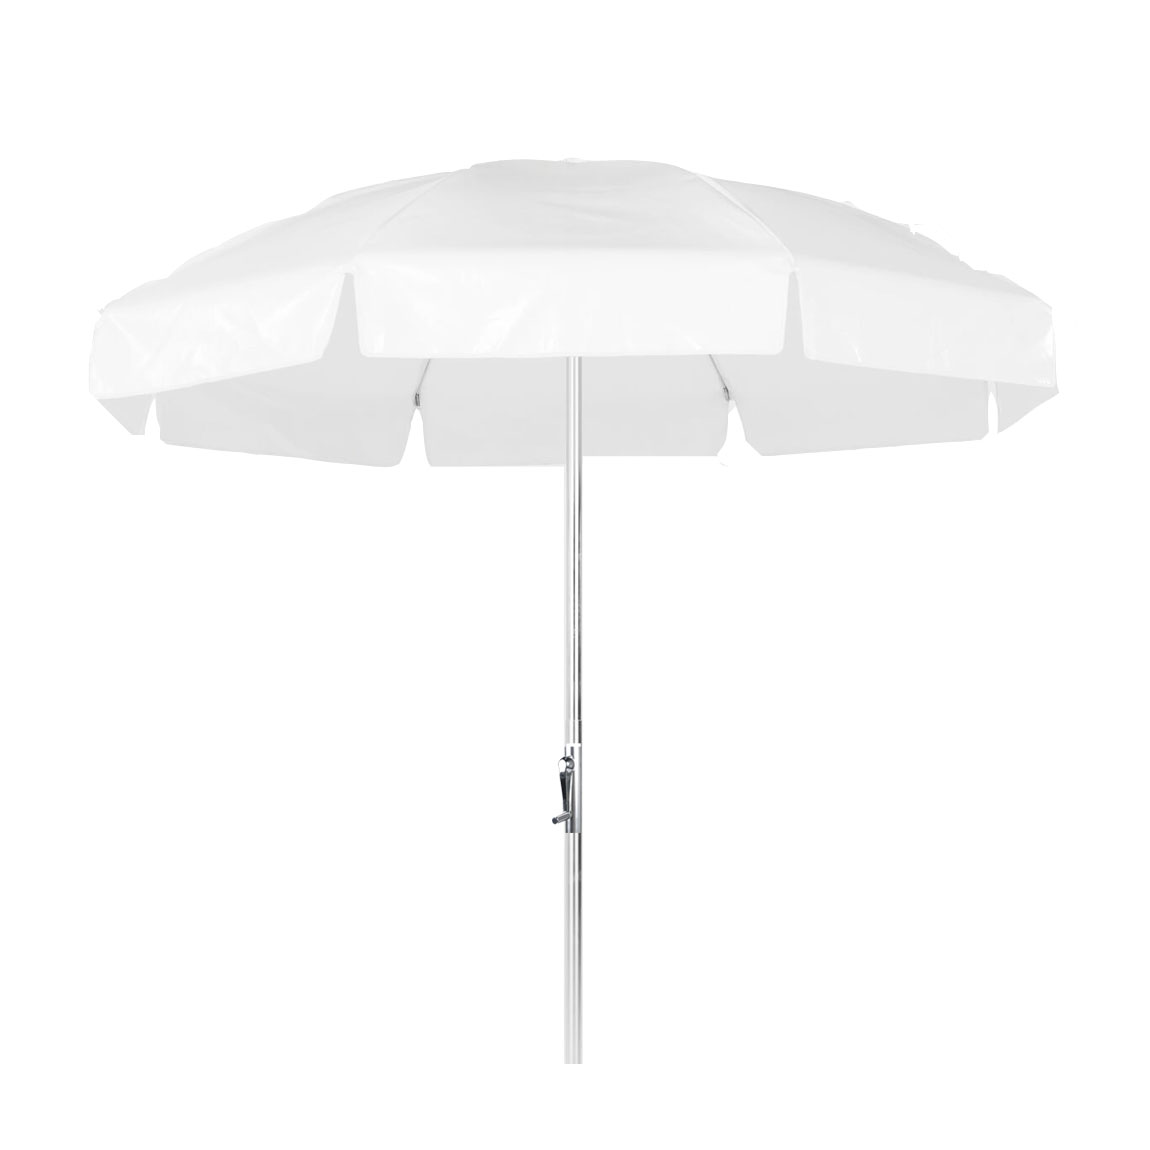 7 5 Ft Commercial Grade Steel Patio Umbrella With Vinyl Canopy